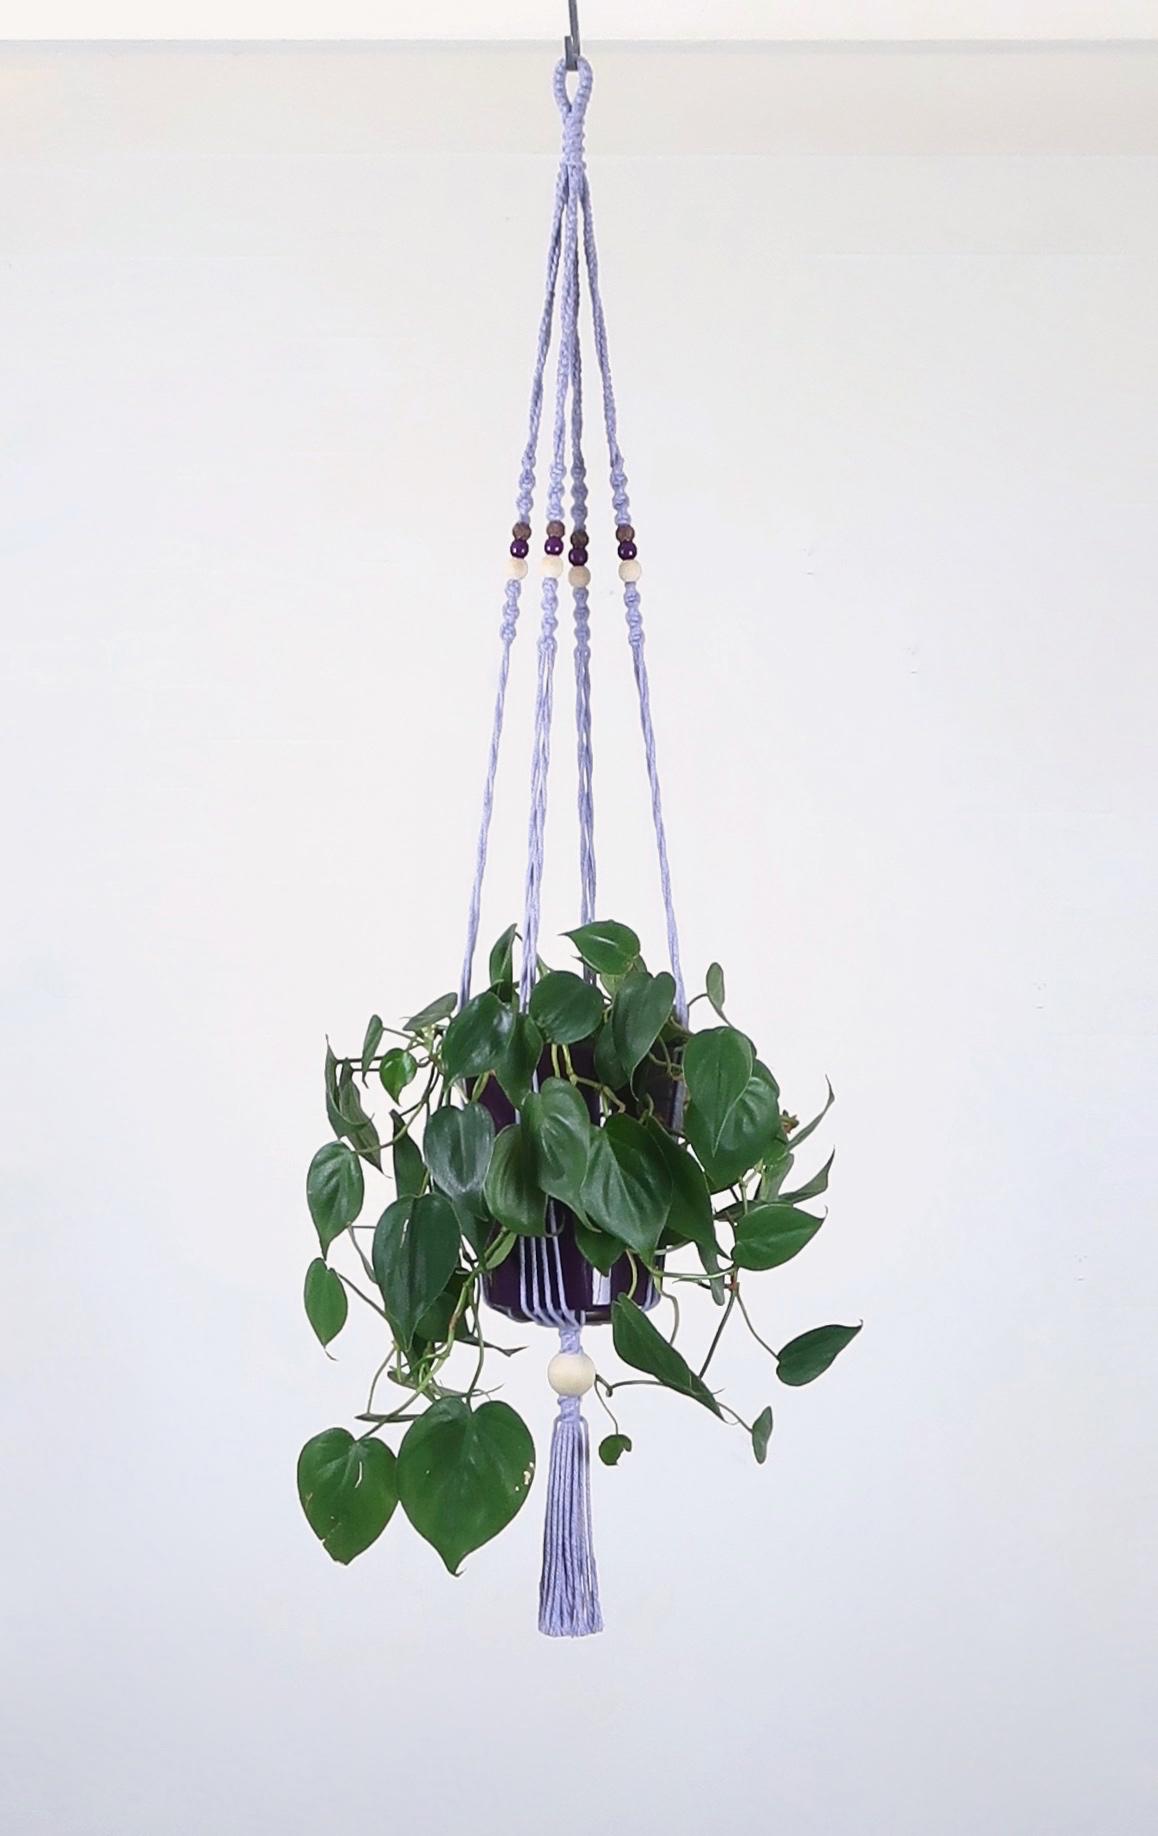 porte pot suspension macram bymadjo edmee d co. Black Bedroom Furniture Sets. Home Design Ideas